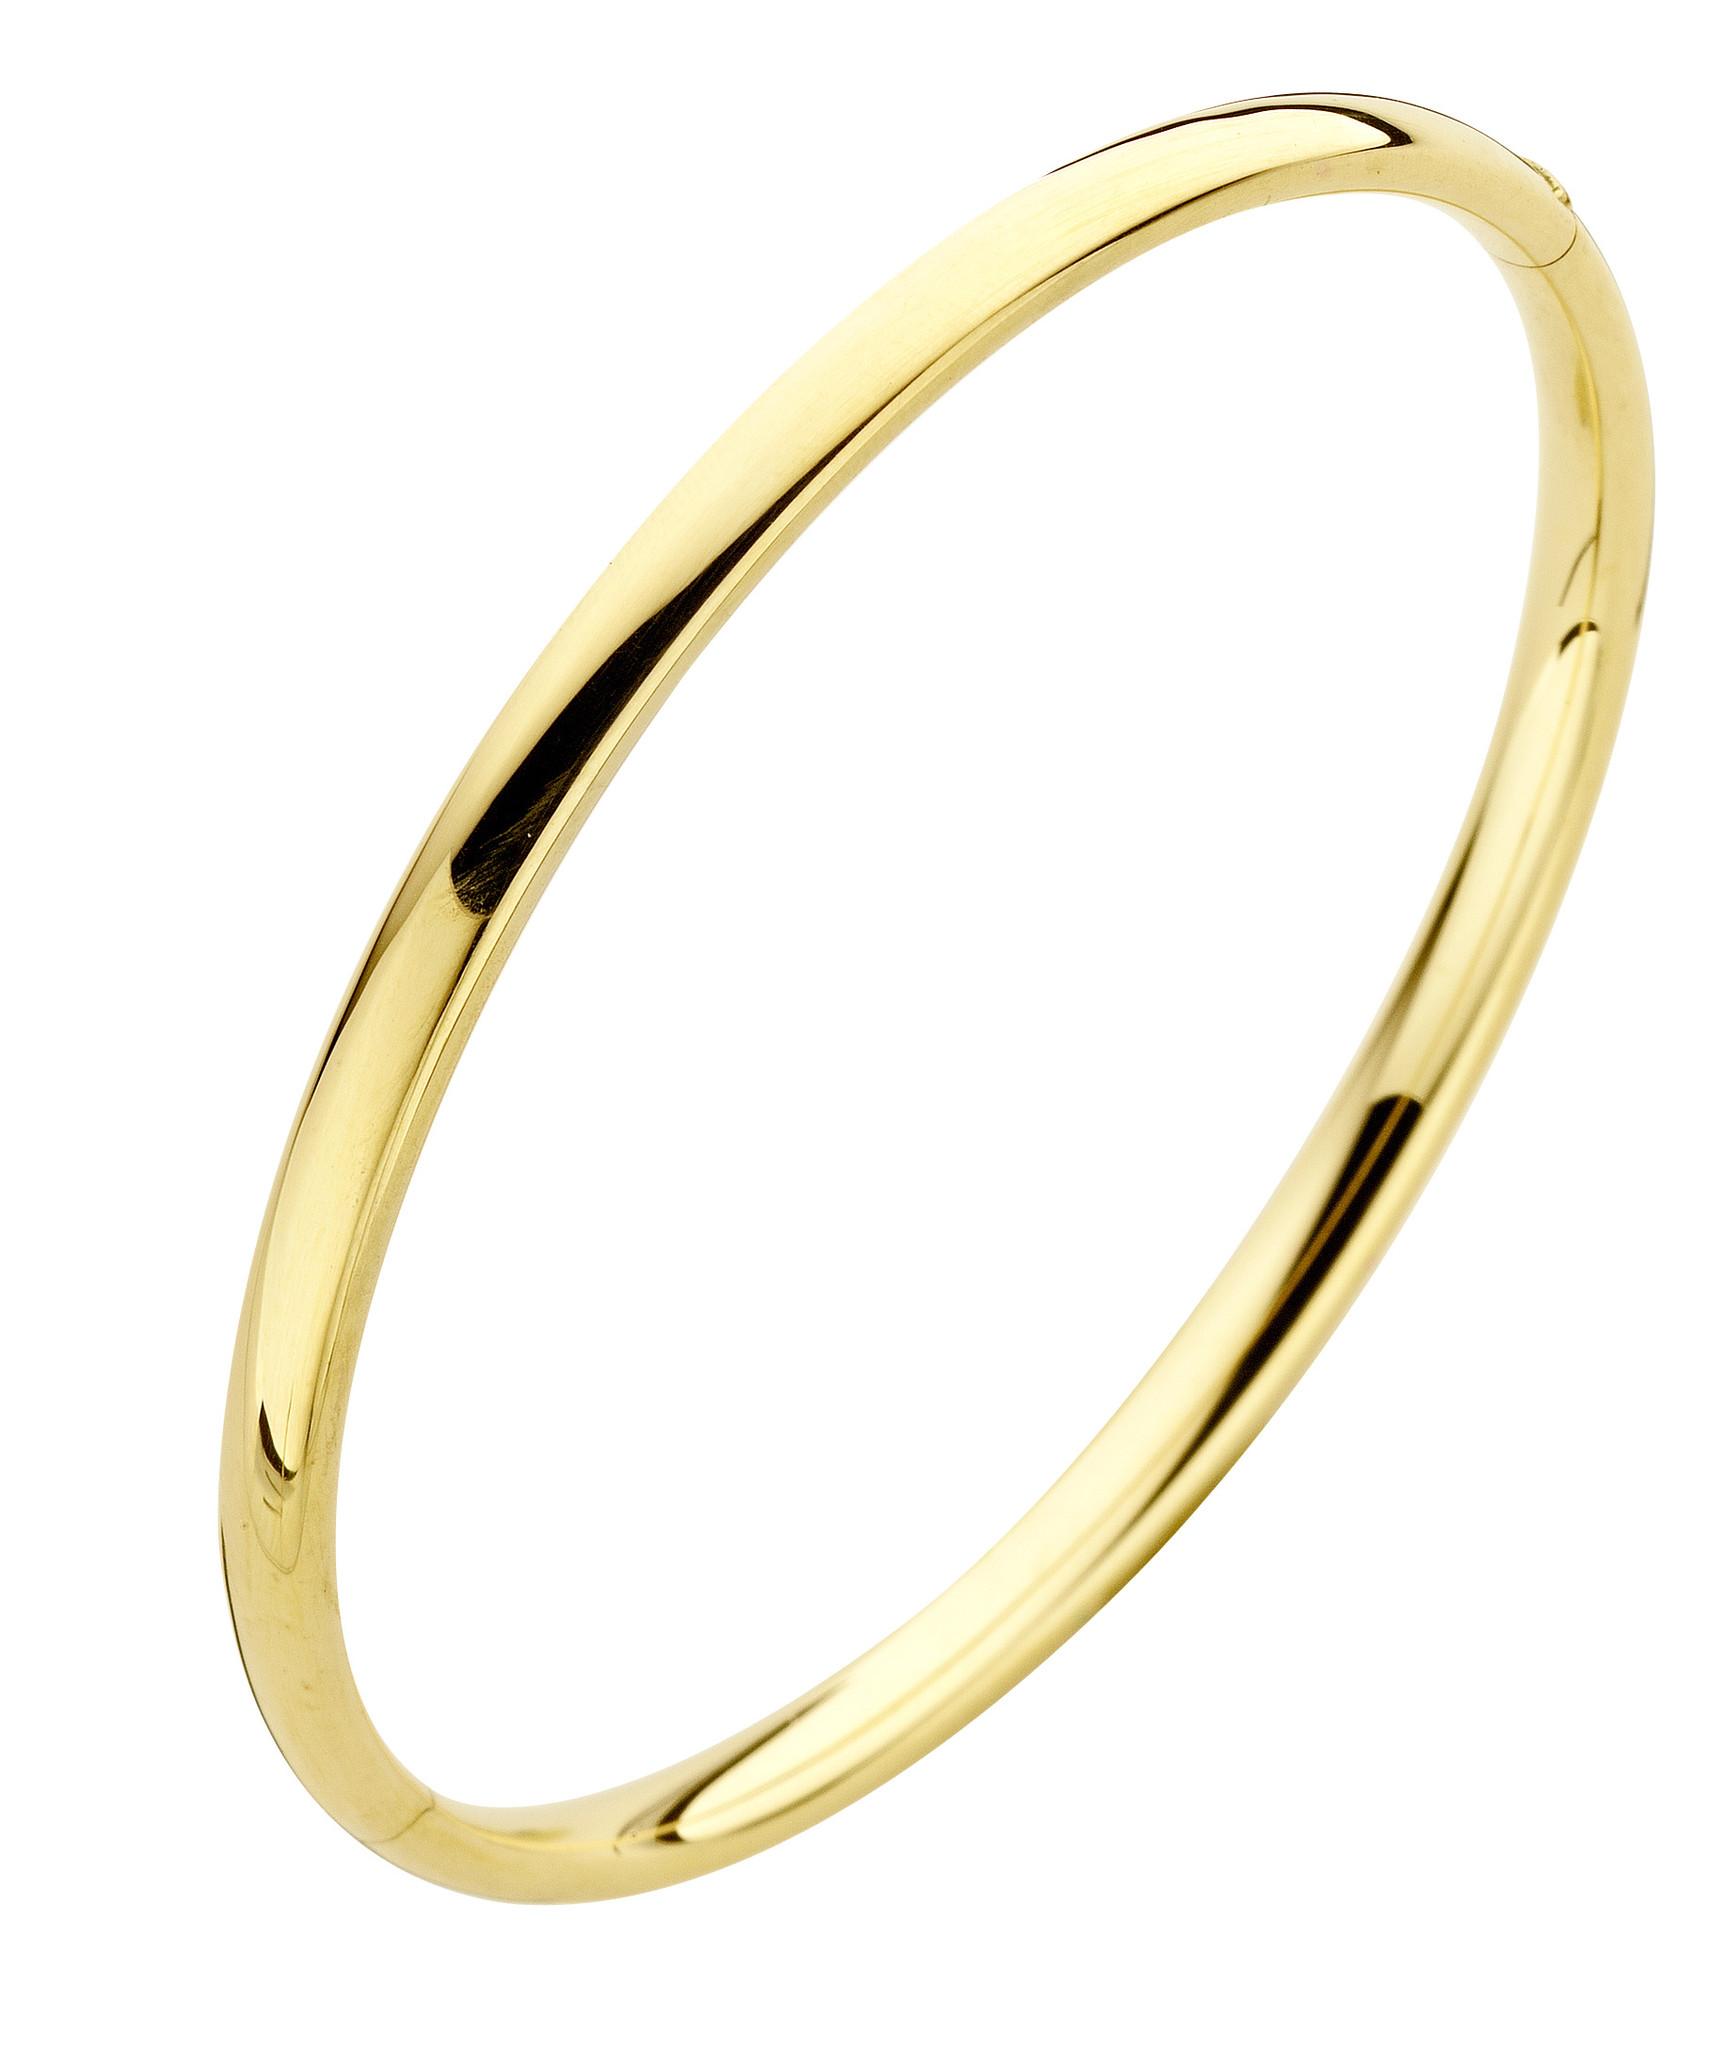 14 karaat geelgouden armband - Ovaal 5 mm - Fjory - Slavenarmband-2